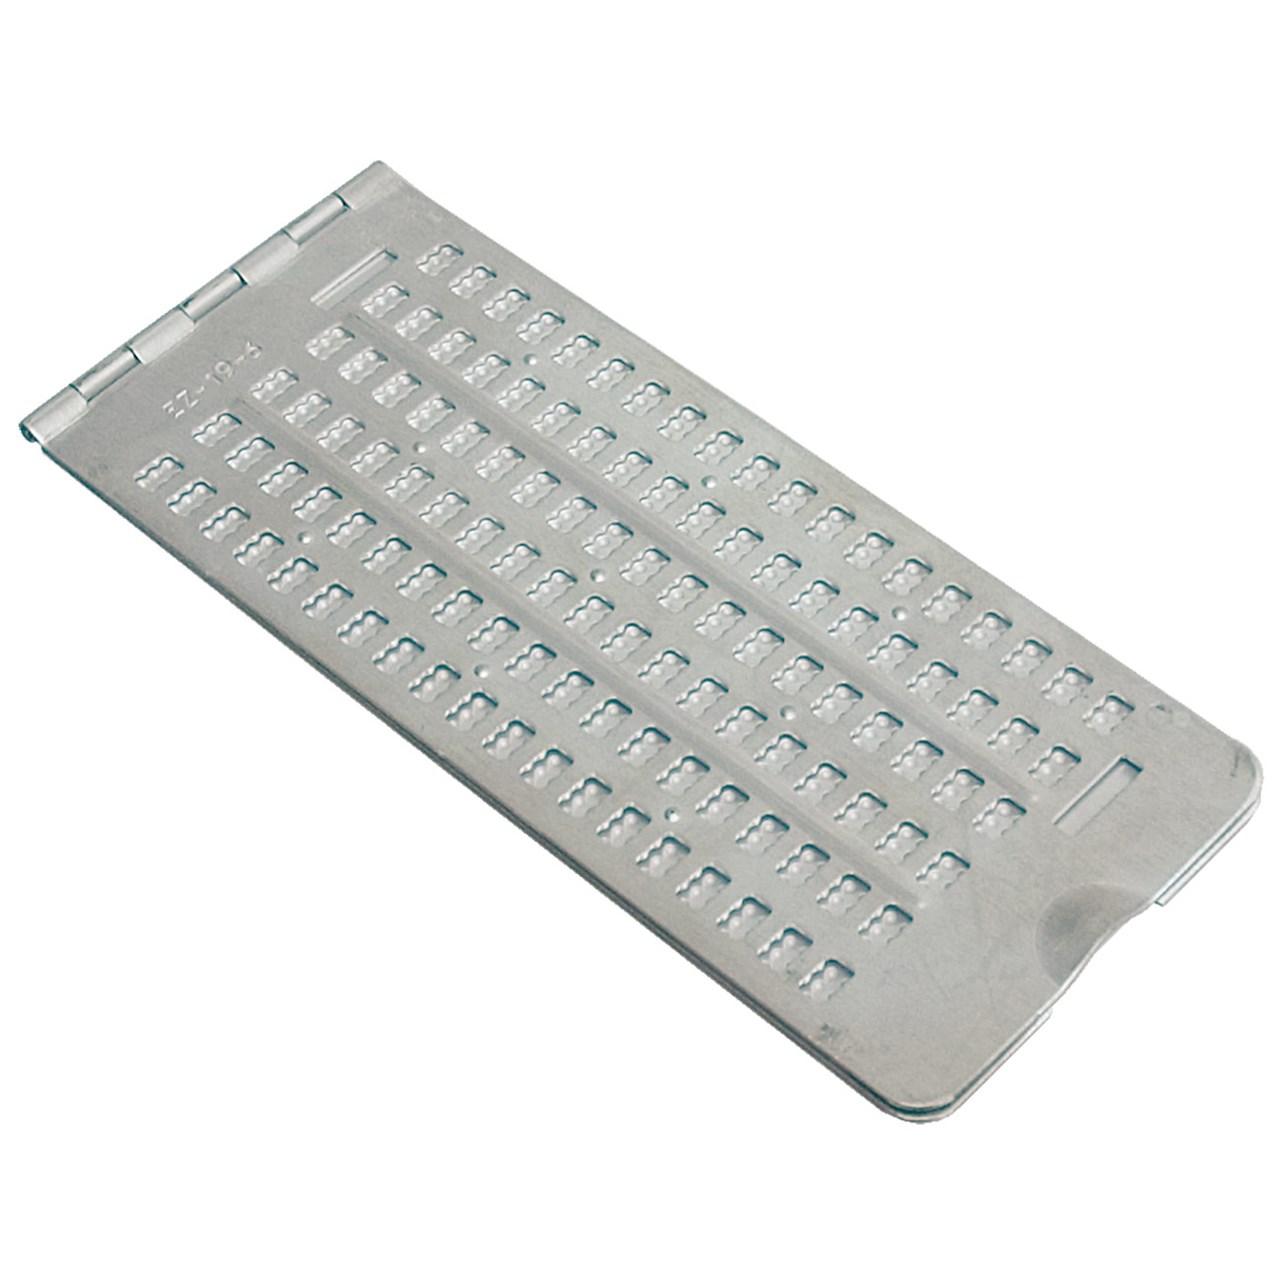 Braille Slate: E-Z